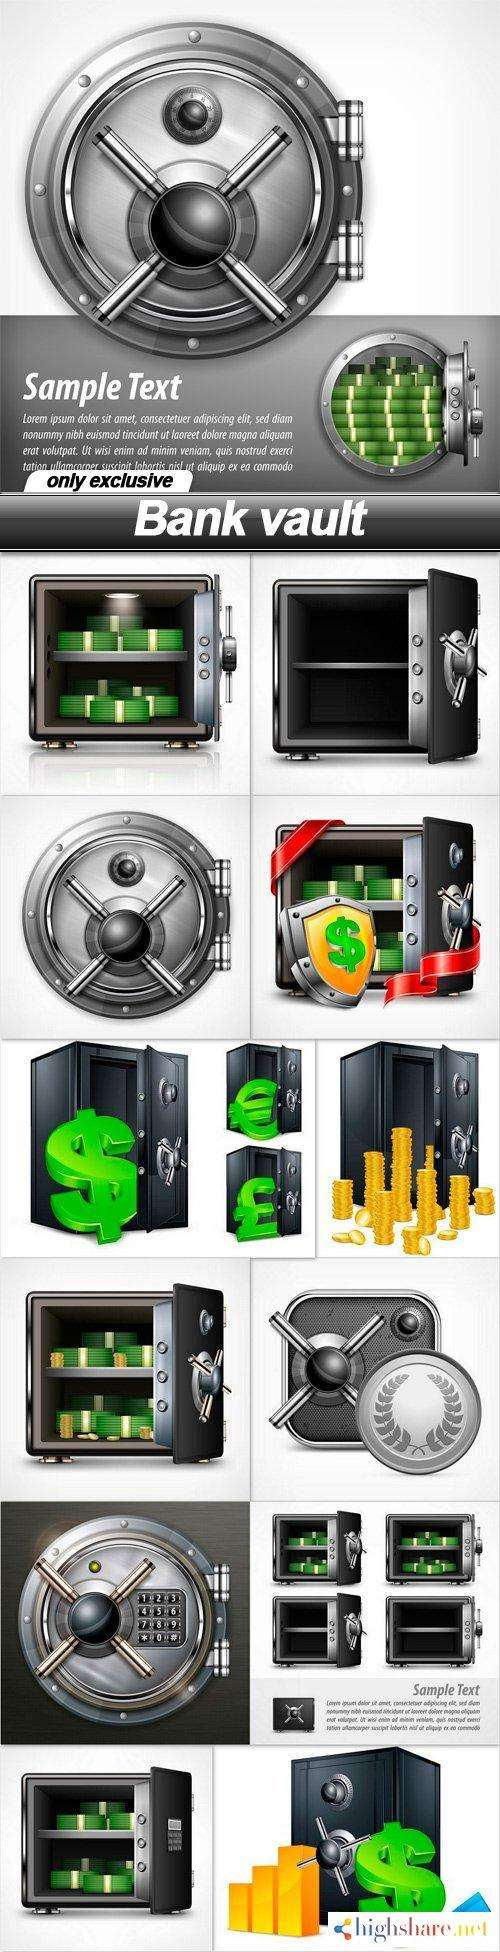 bank vault 13 eps 5f4211ef4723e - Bank vault - 13 EPS